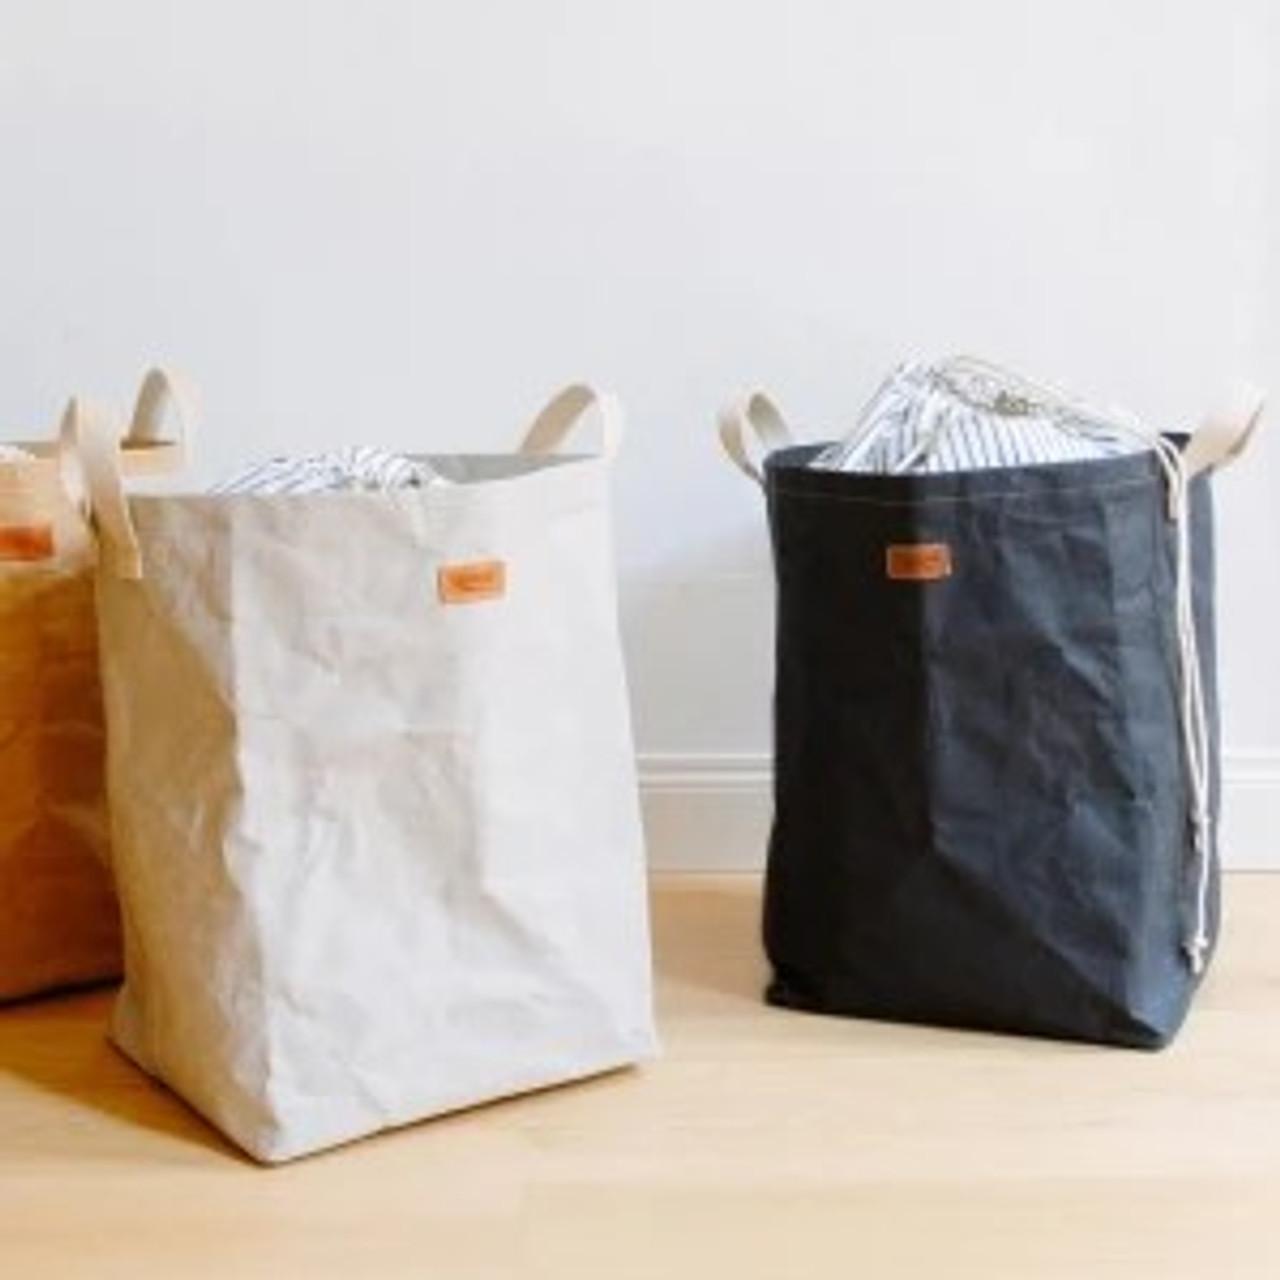 uashmama positano laundry organic paper